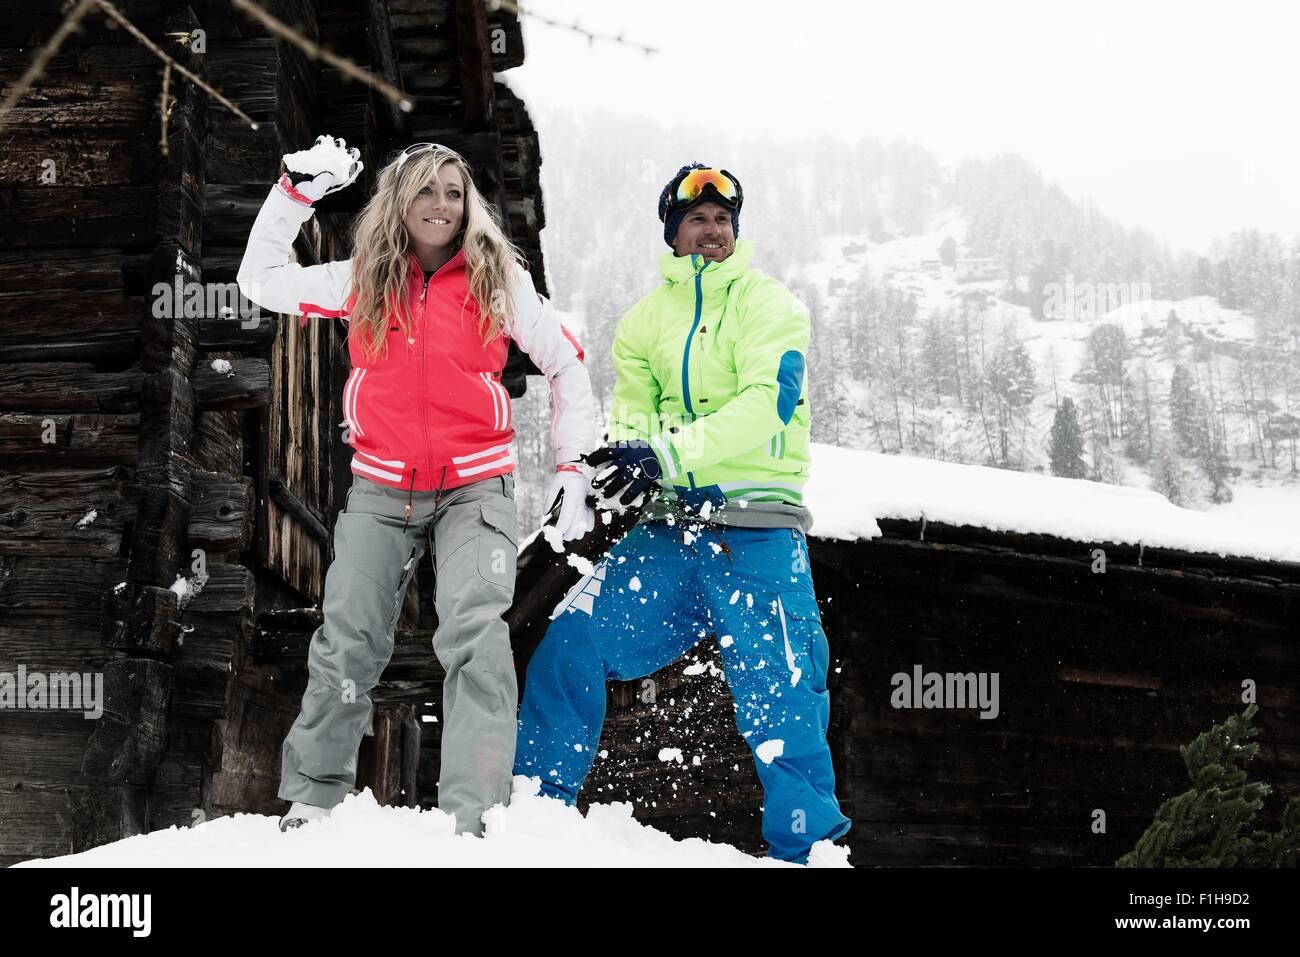 Man and woman throwing snowballs - Stock Image